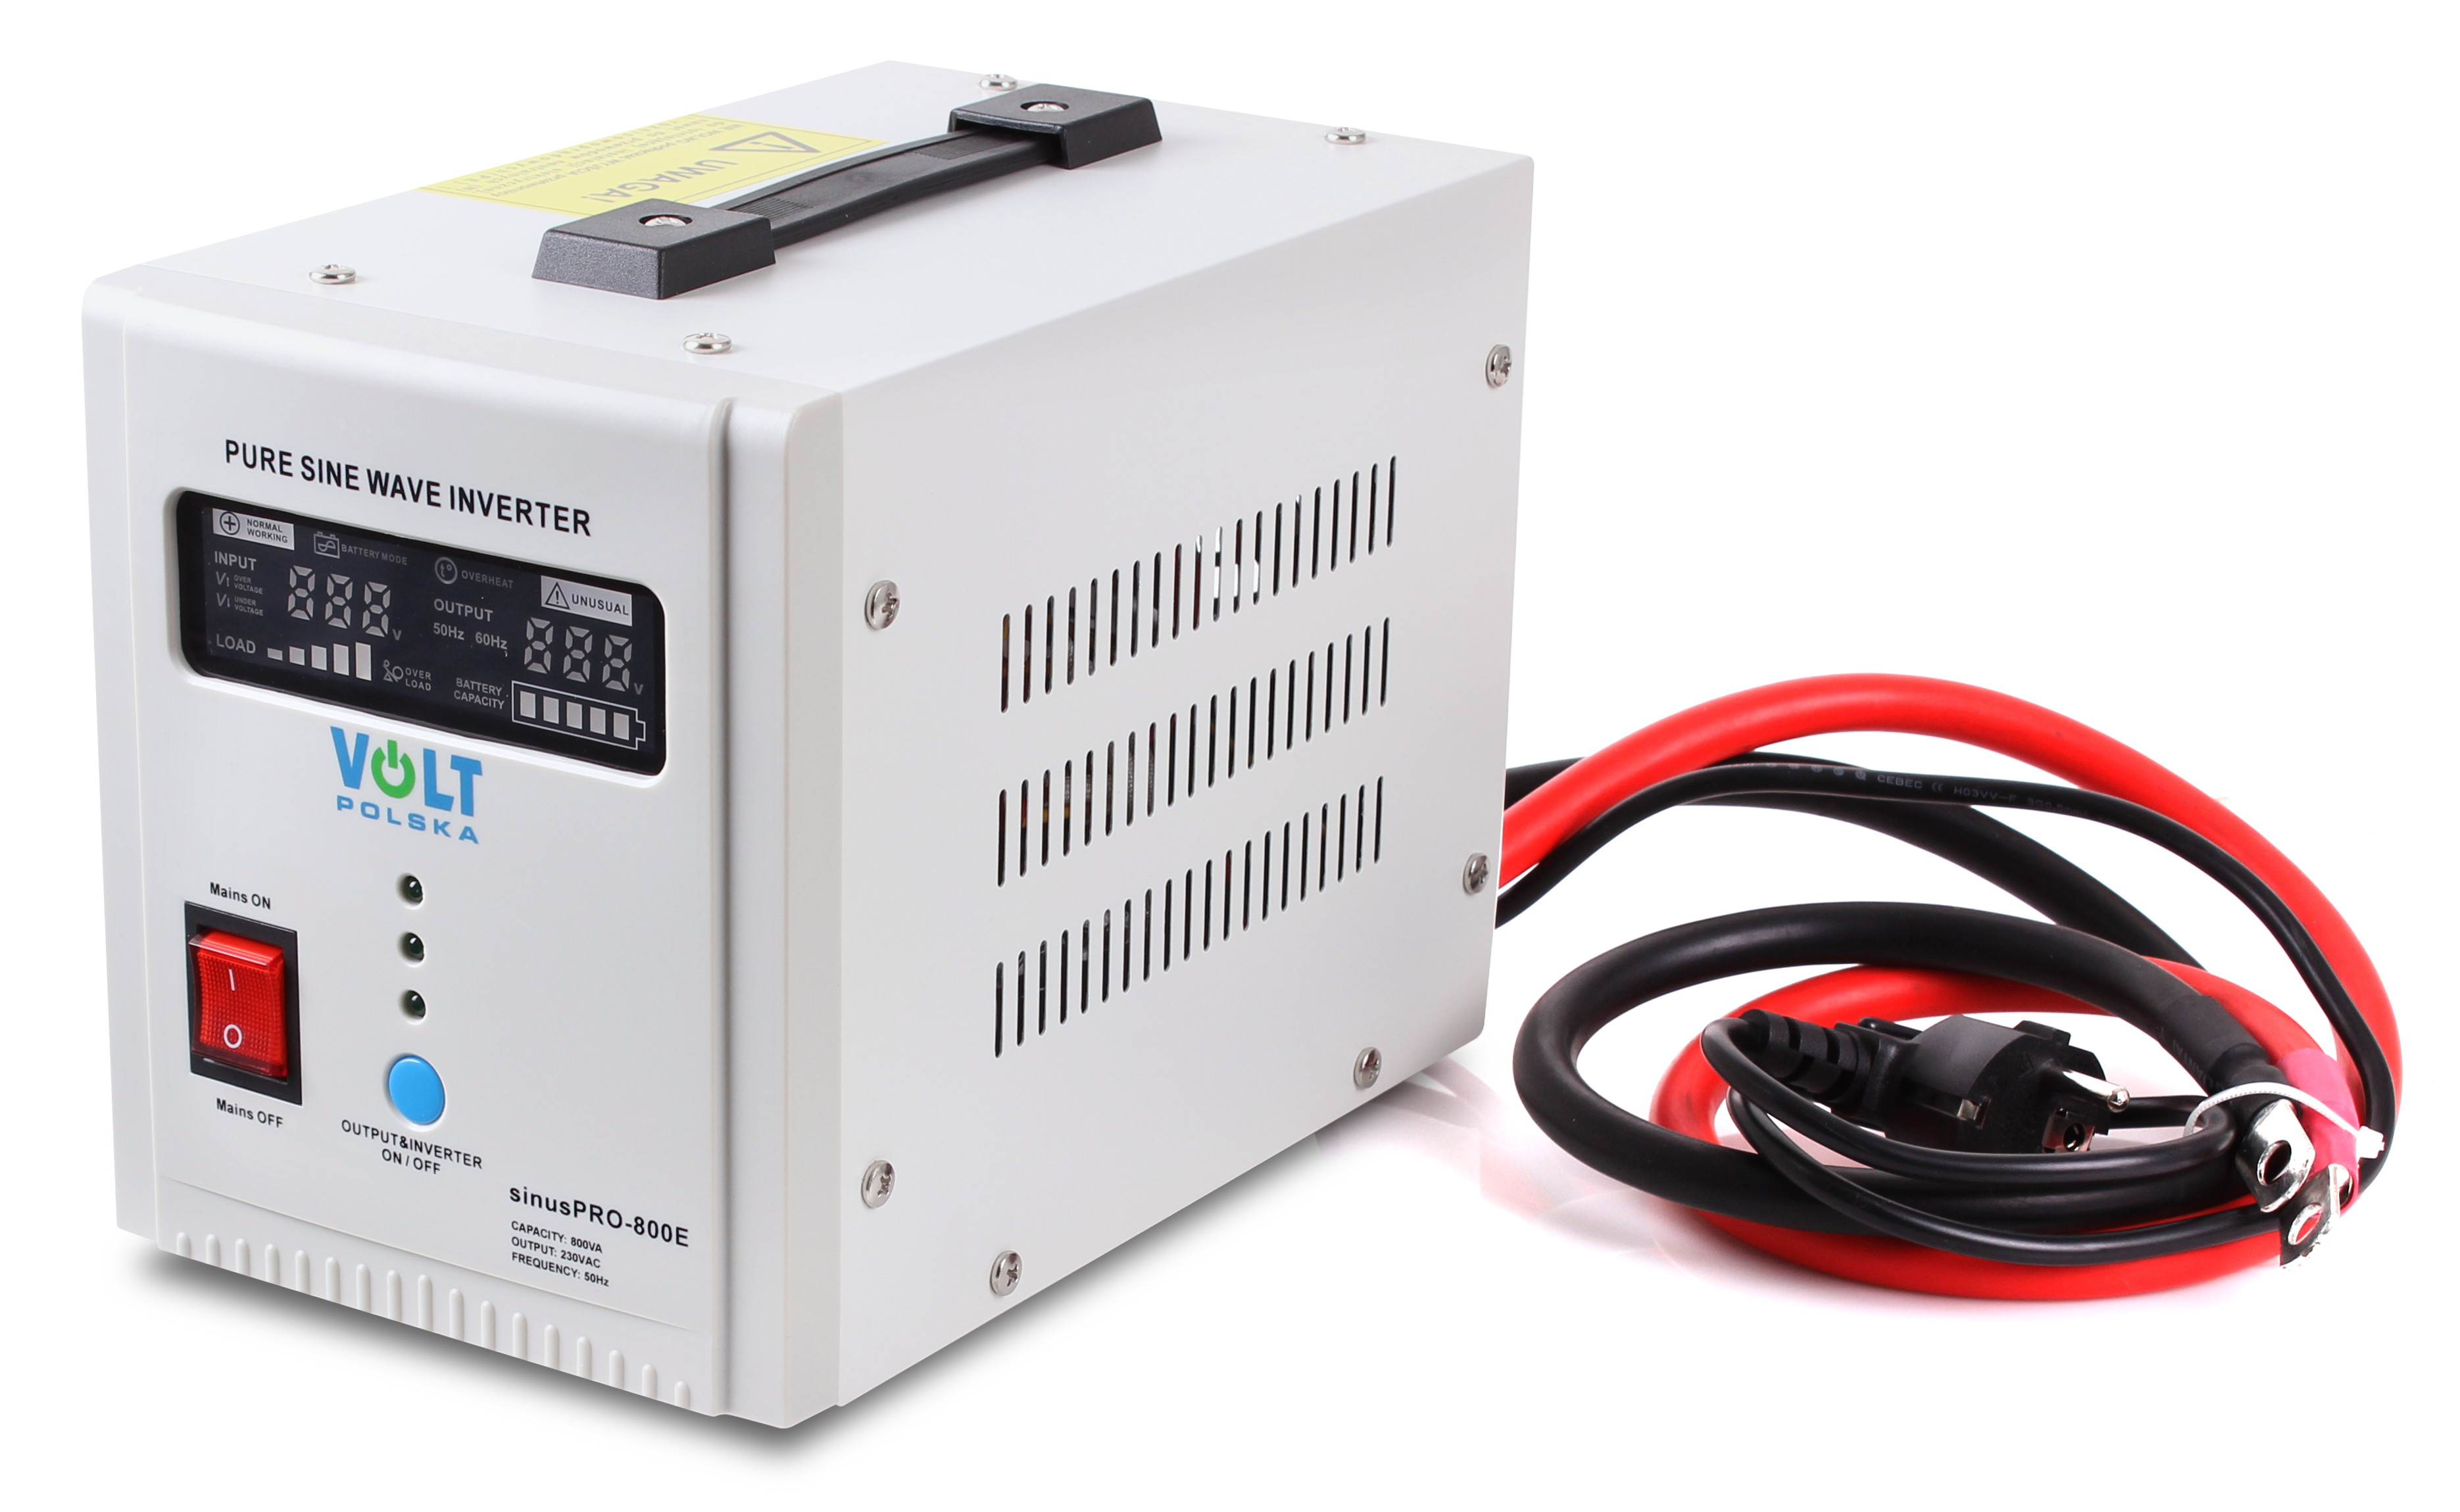 PRZETWORNICAVOLT SINUSPRO-800E12V 500/800W